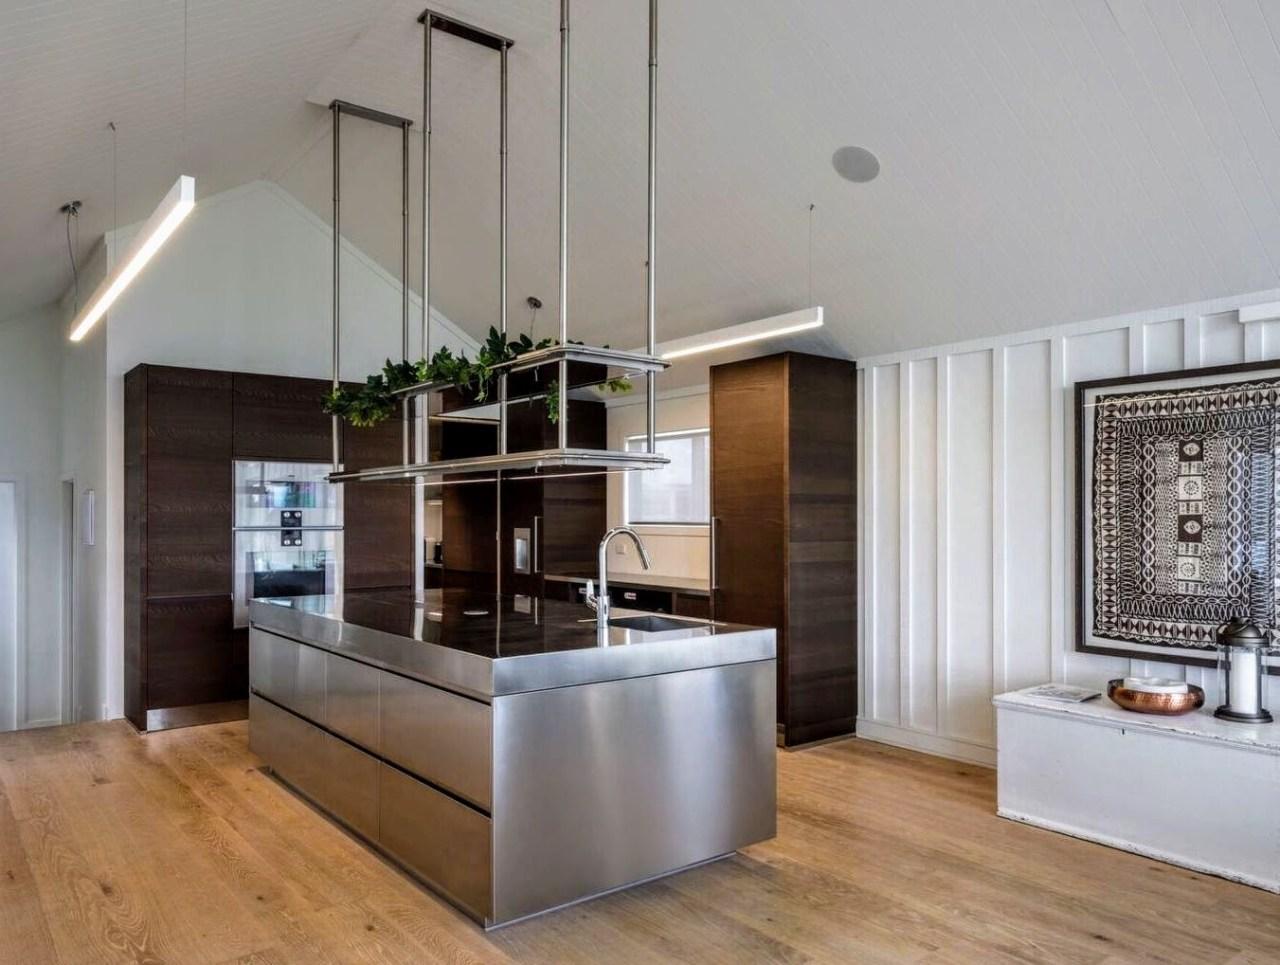 Stainless steel island doors, tops and plinths contrast countertop, floor, interior design, kitchen, gray